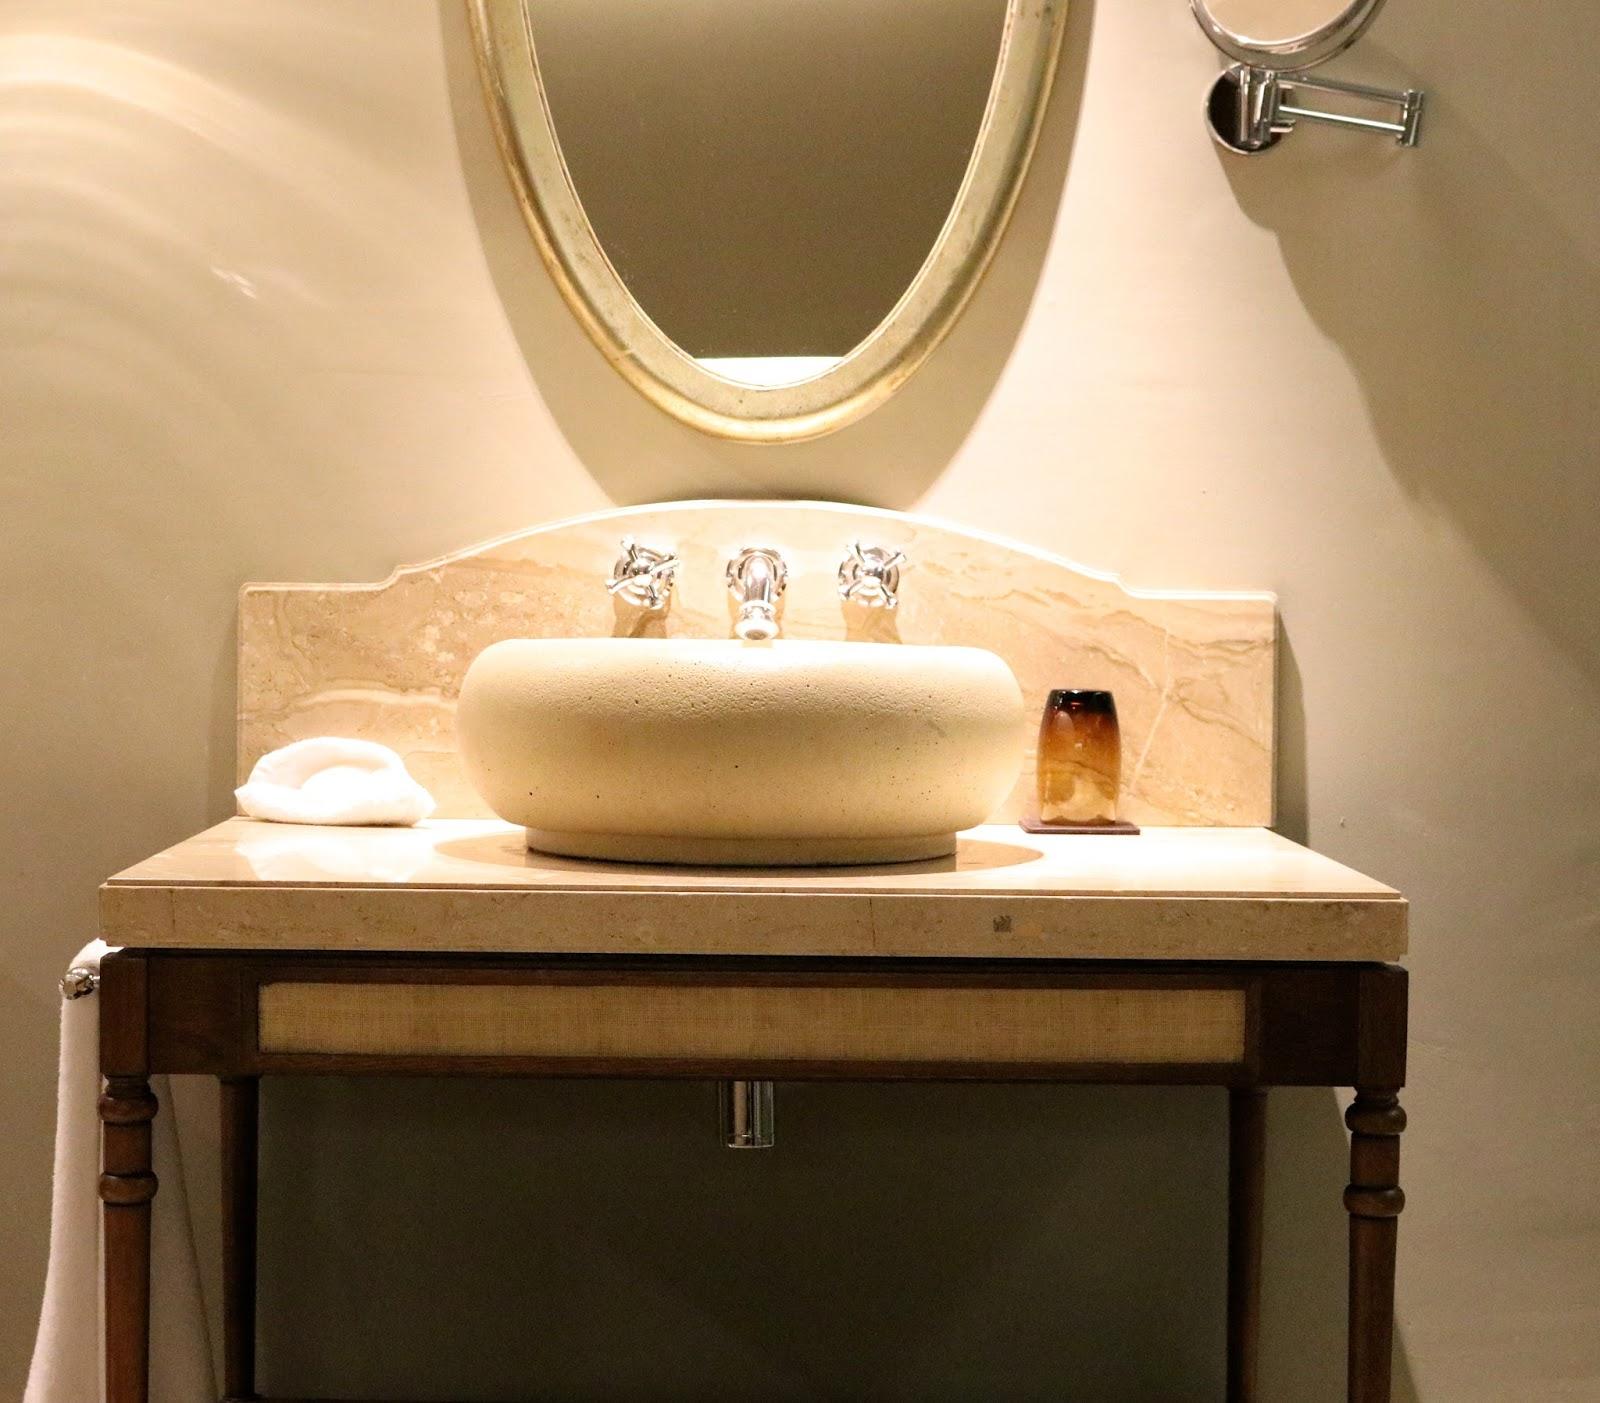 St Regis Bathroom